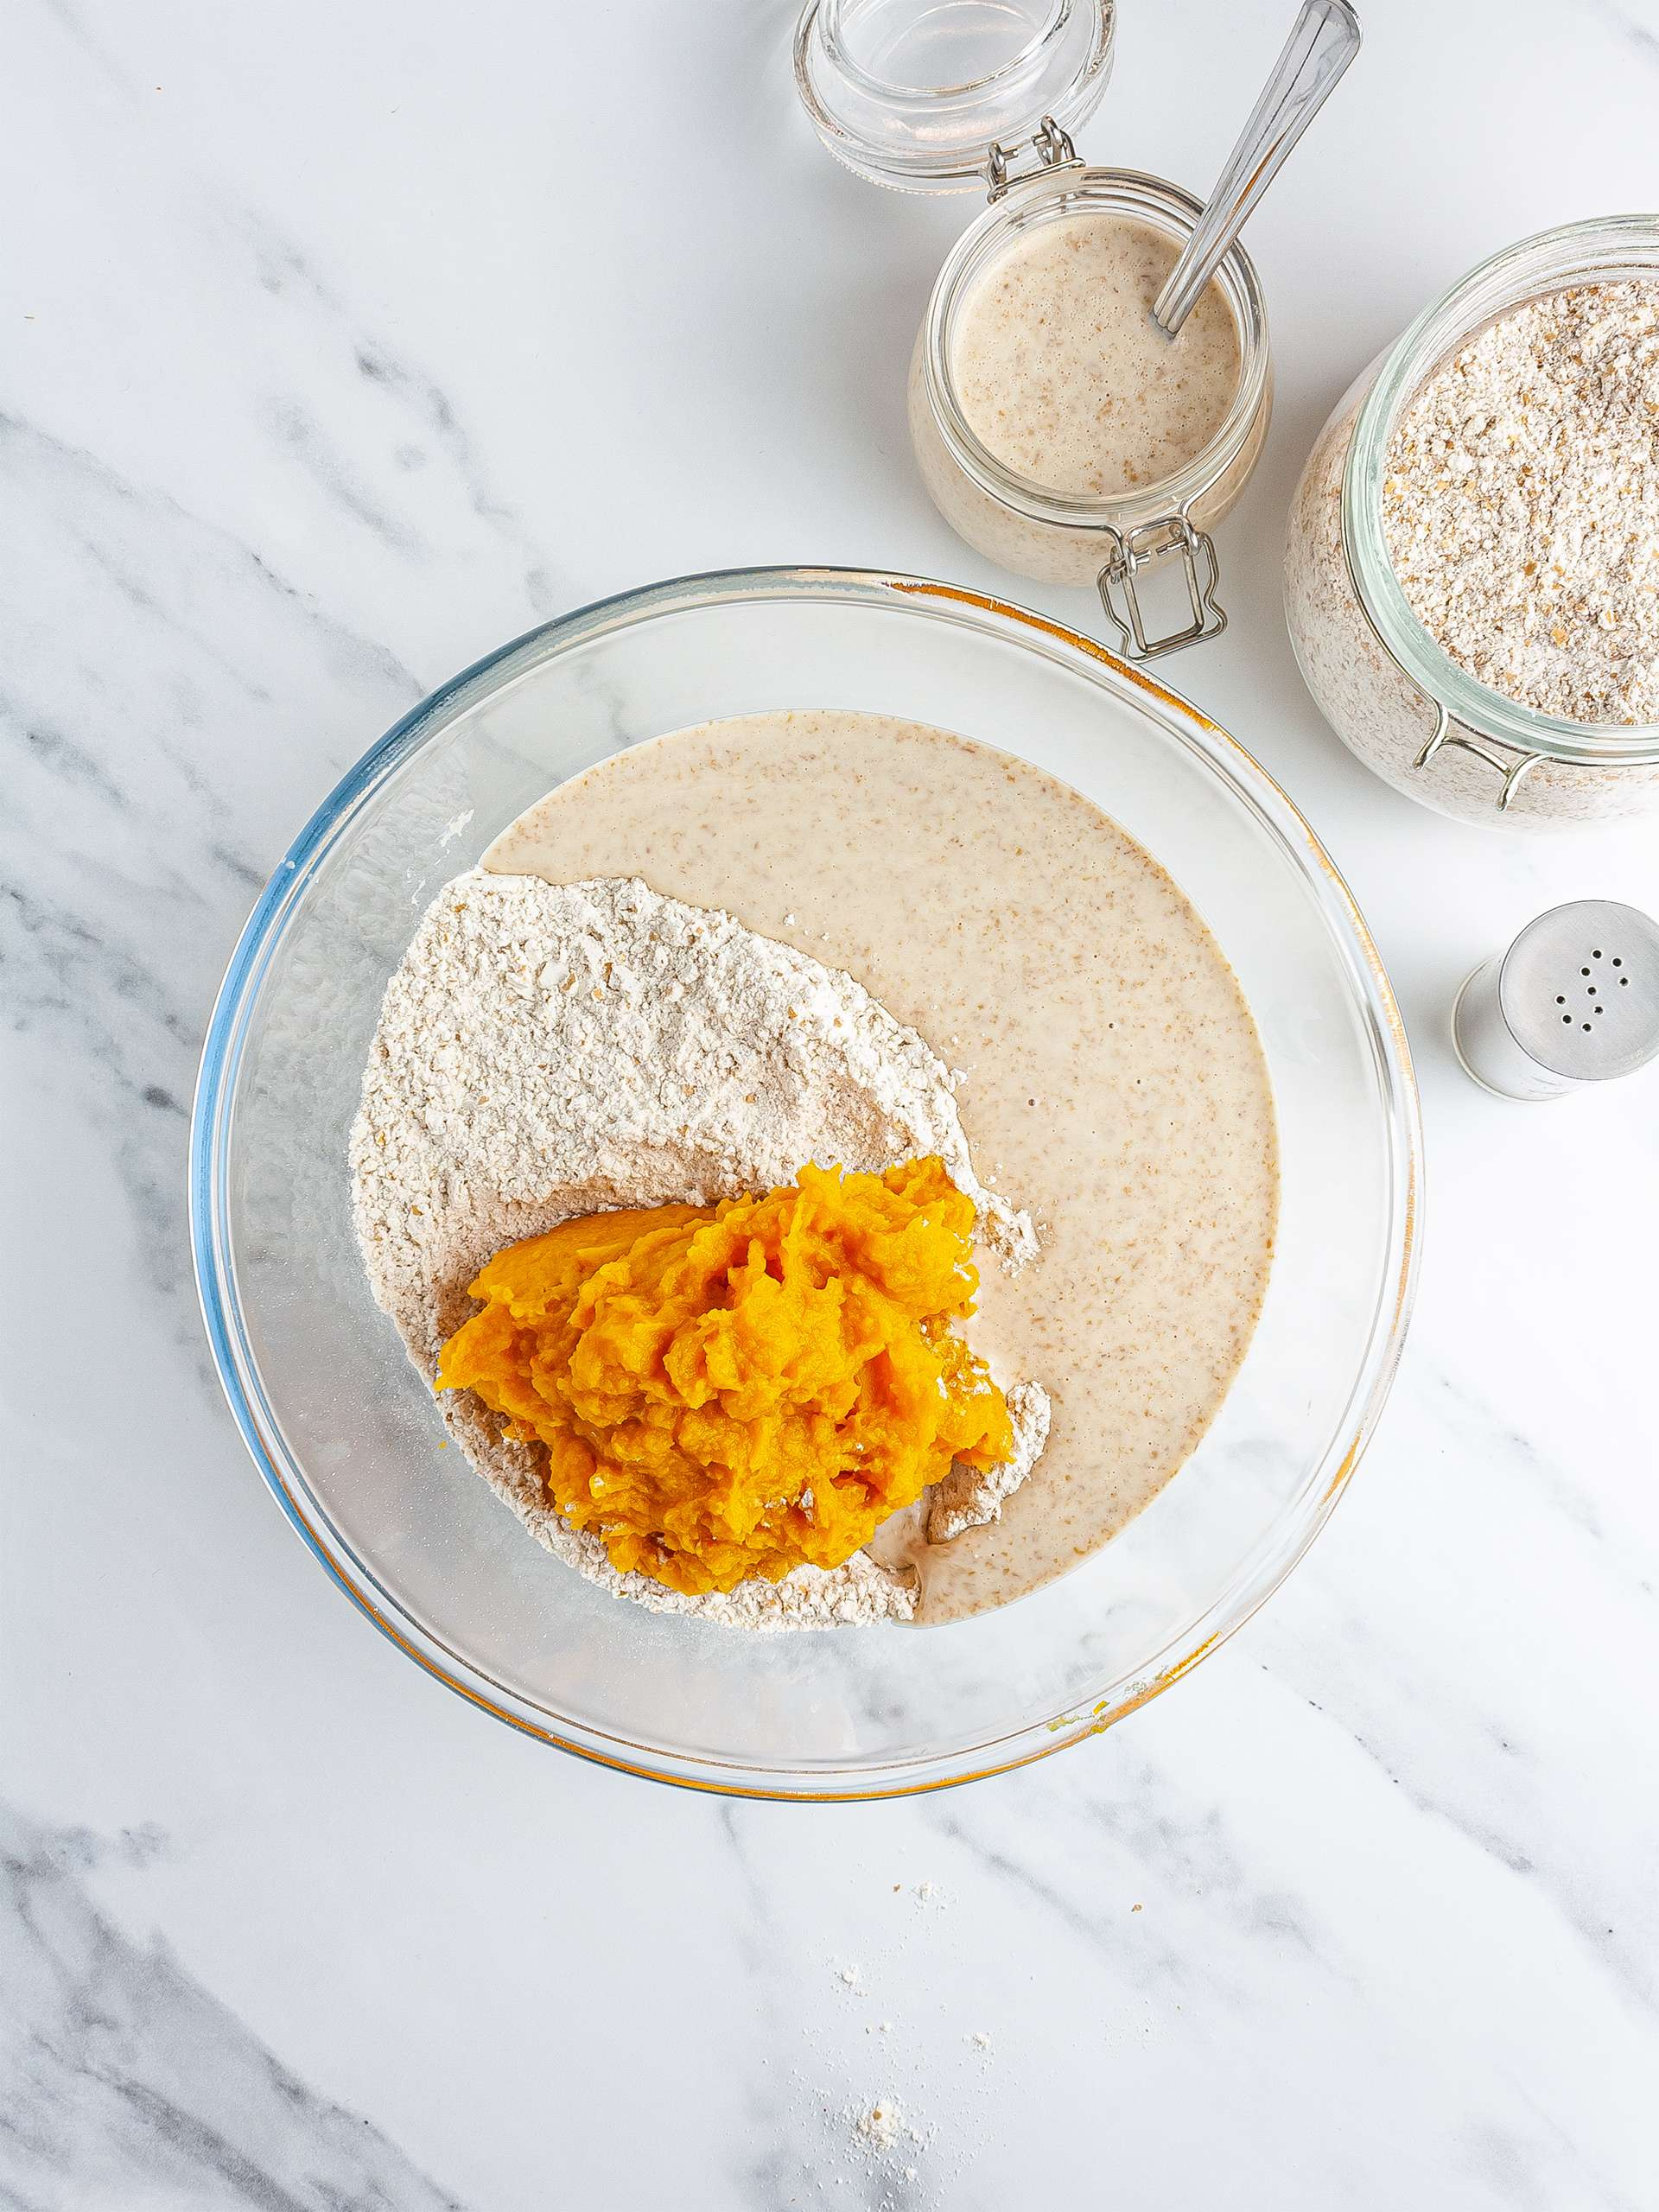 sourdough pumpkin dough mix in a bowl